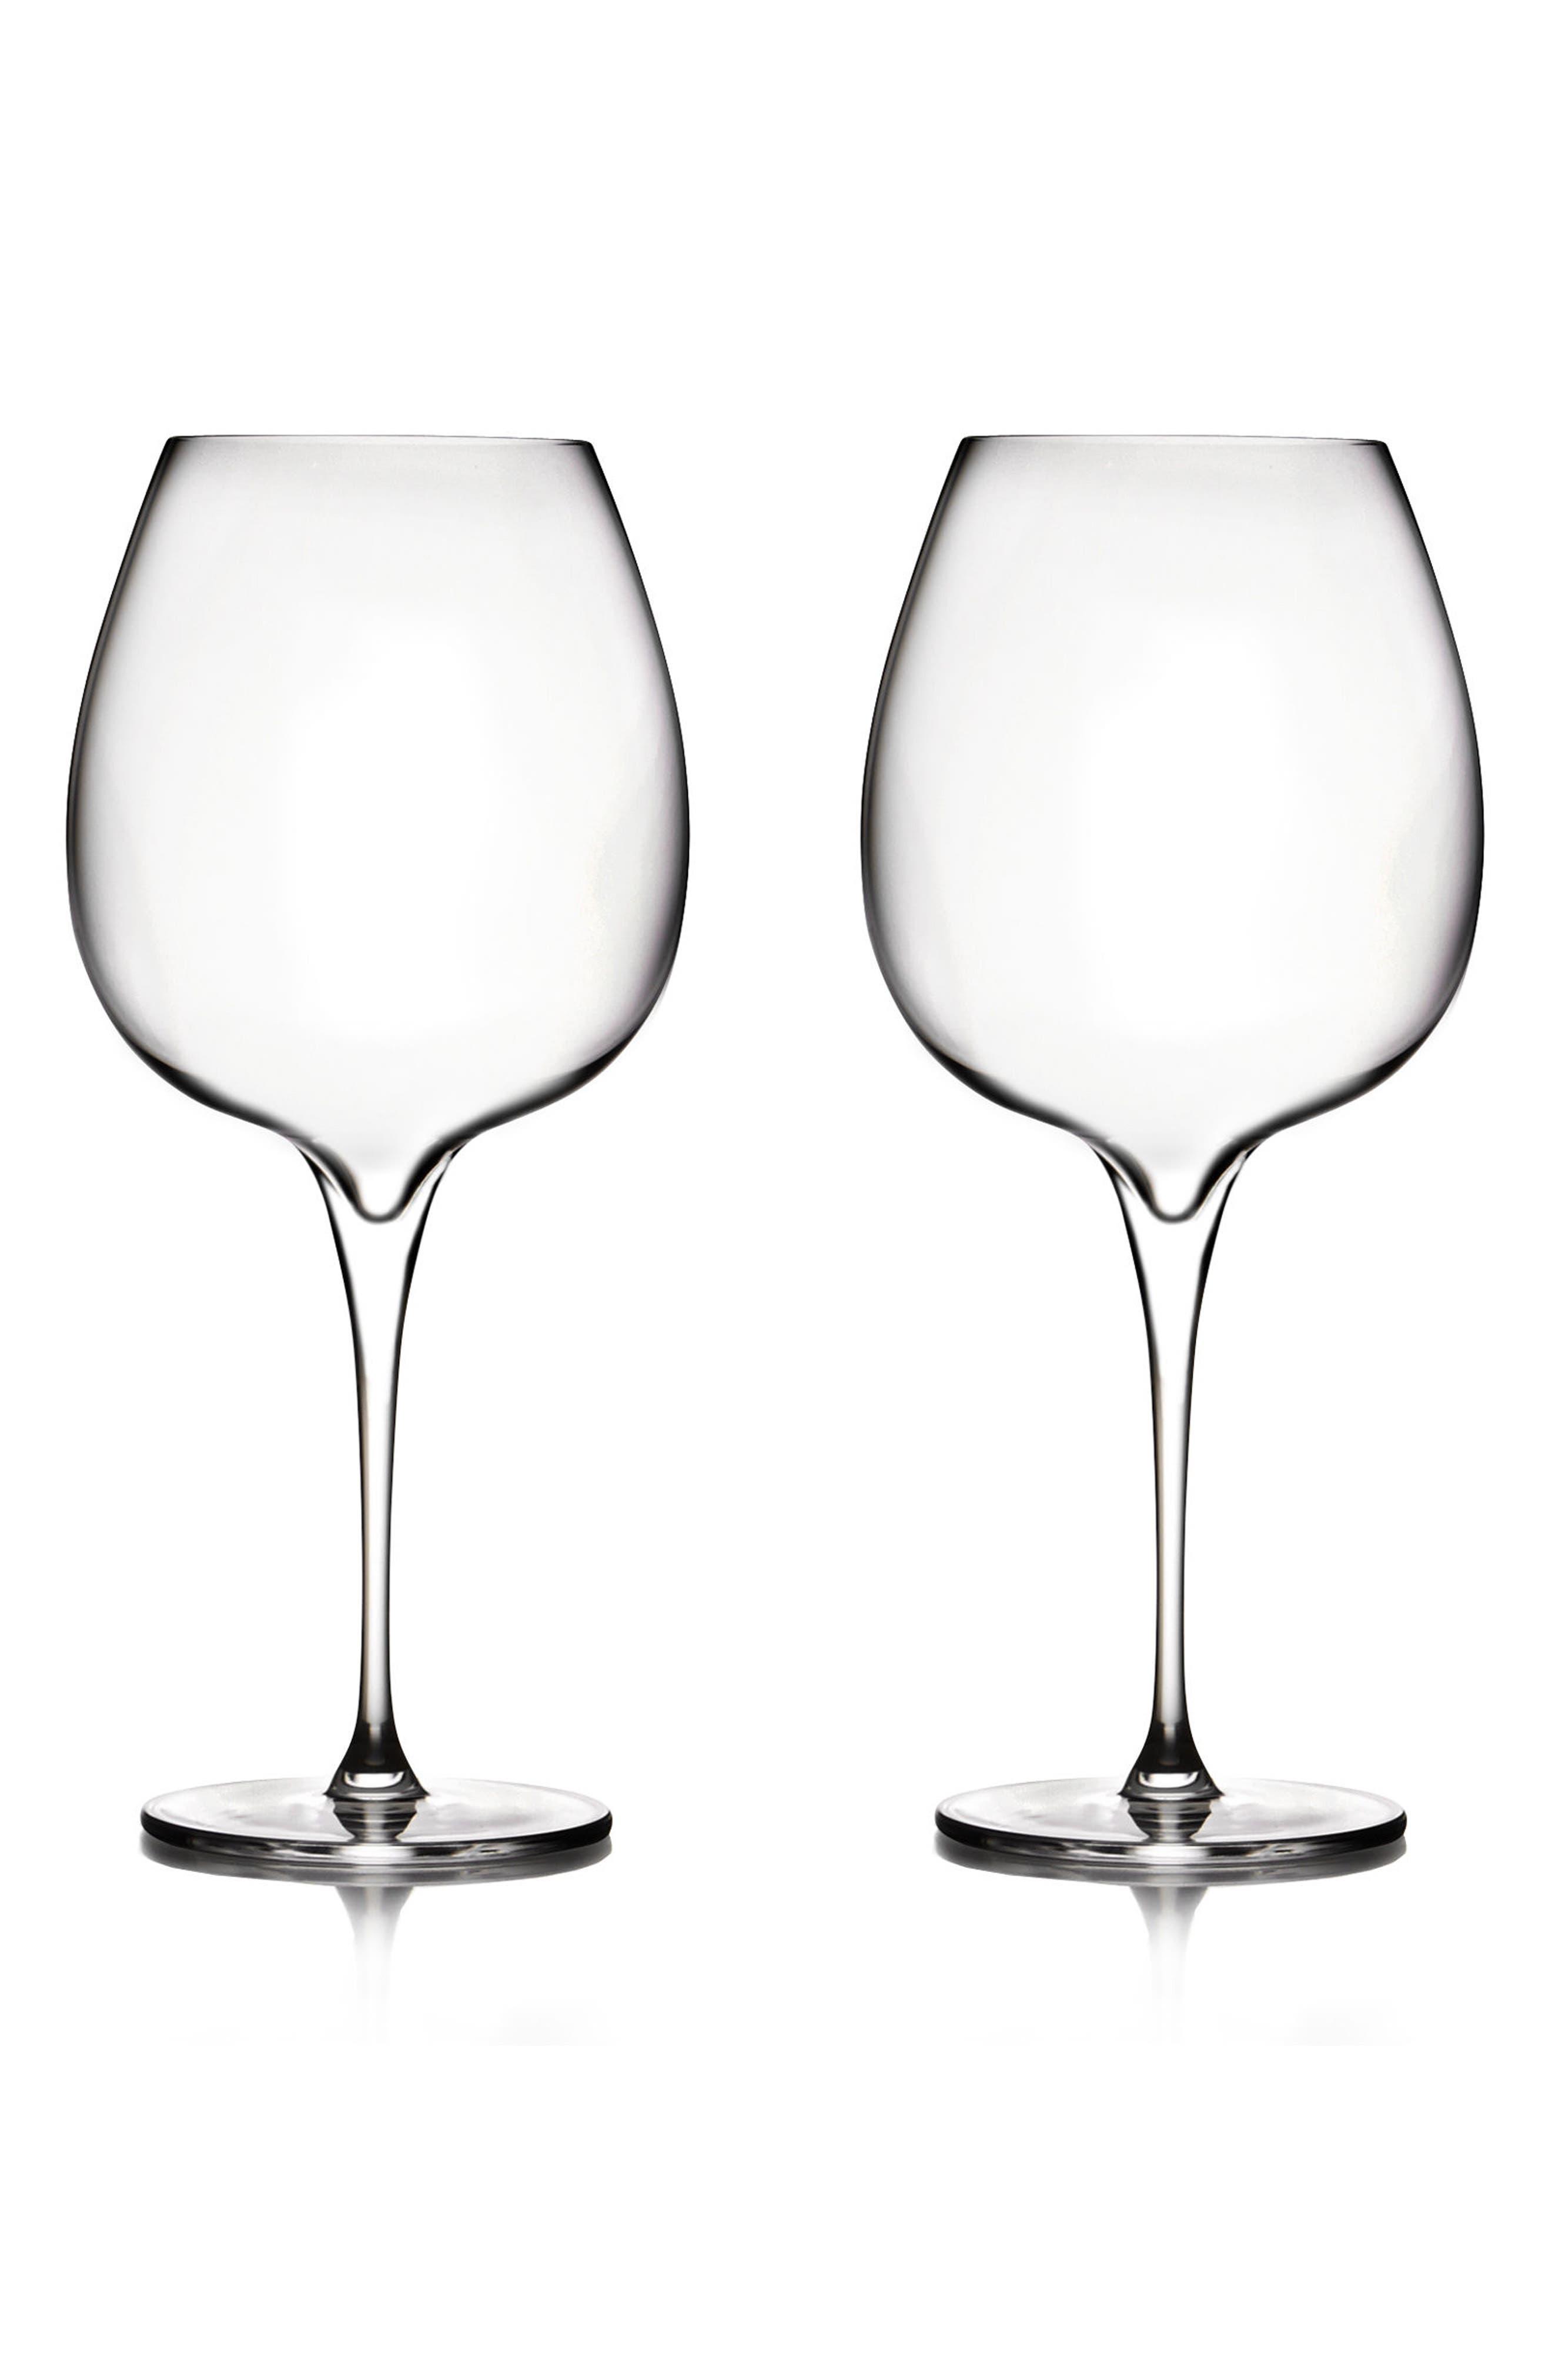 Main Image - Nambé Vie Set of 2 Pinot Noir Glasses